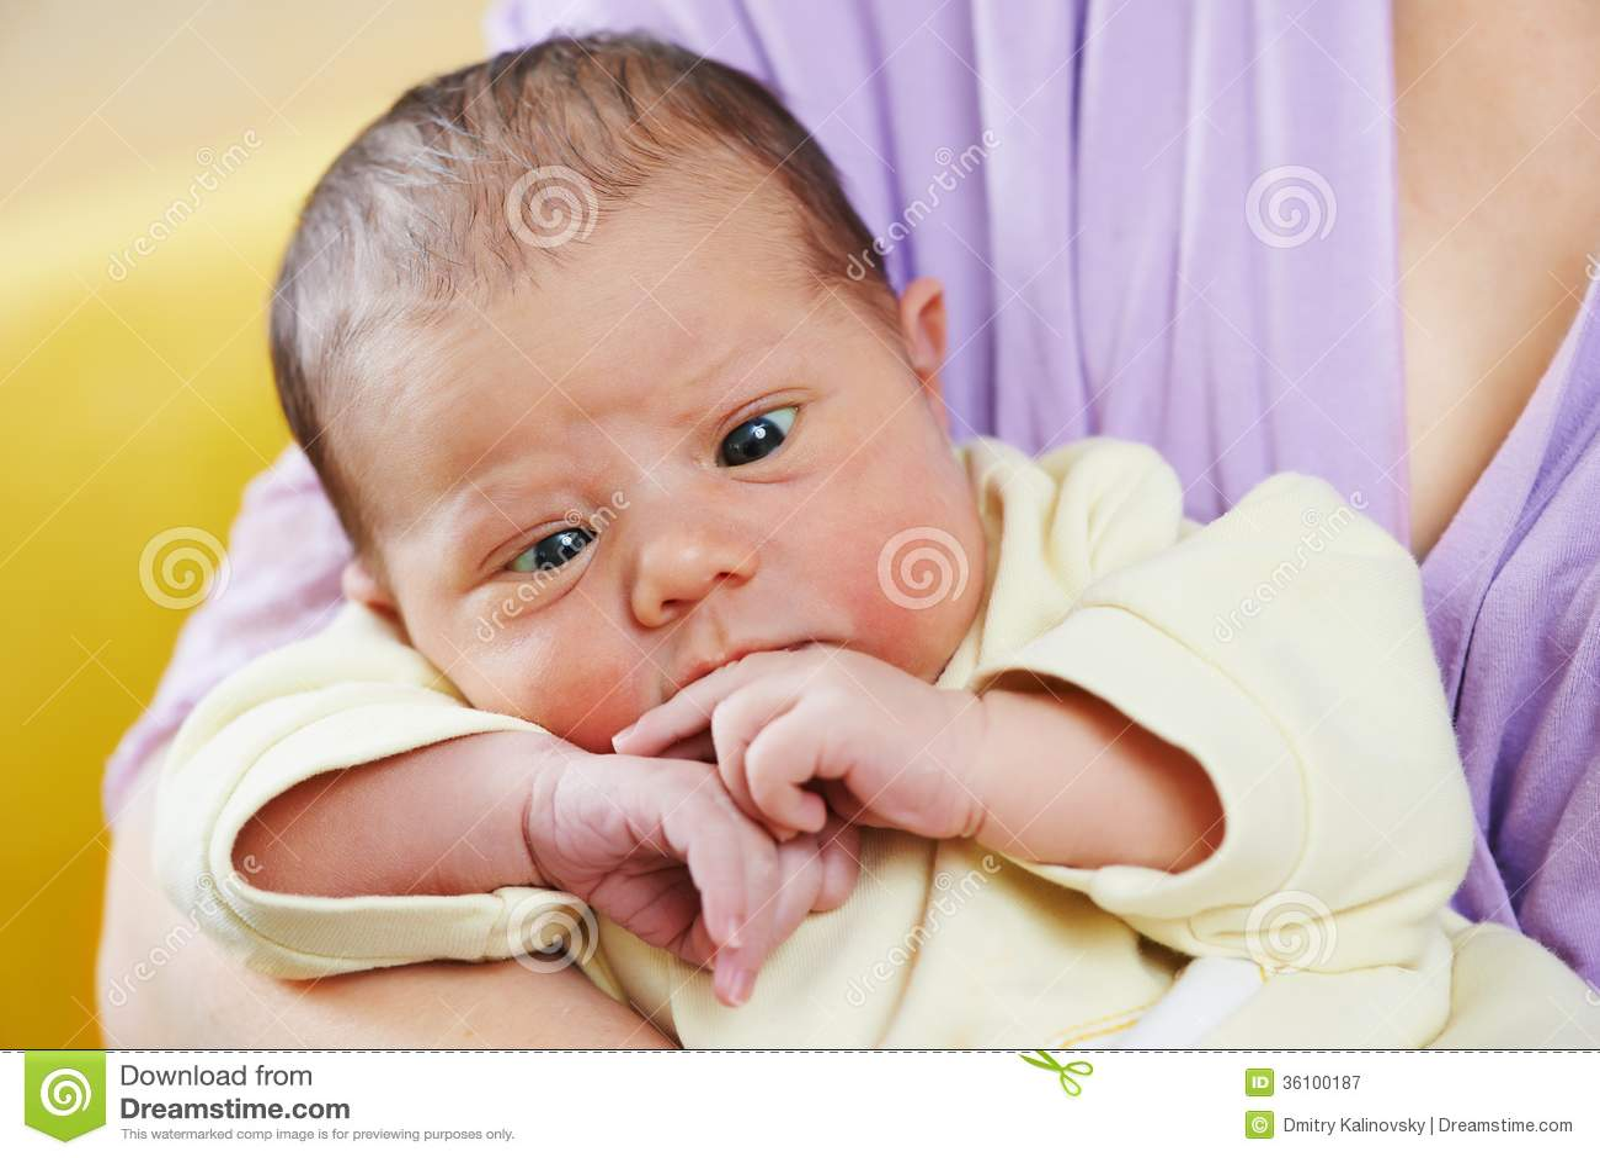 Squint of newborn baby